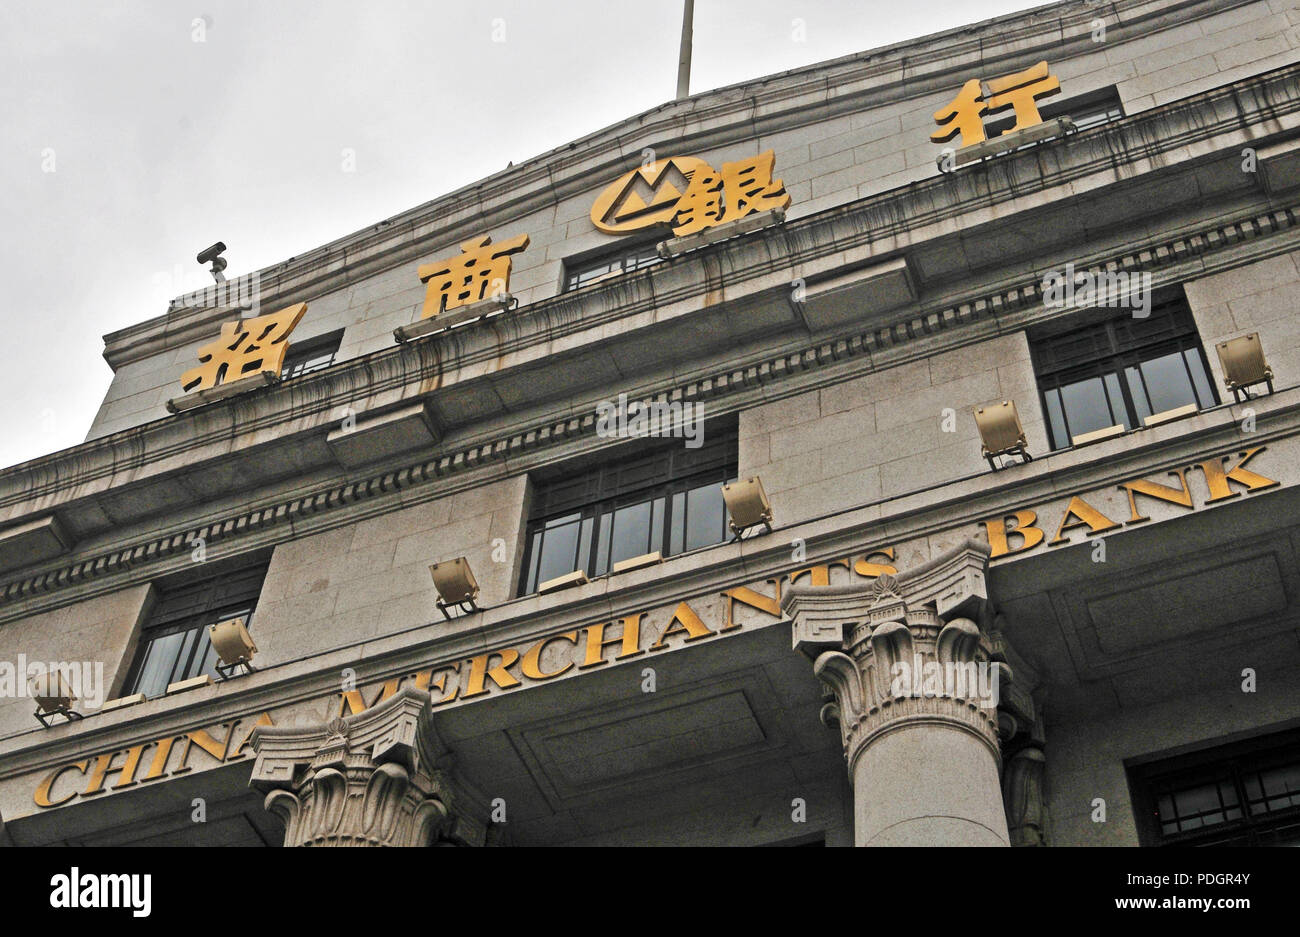 China Merchants Bank building, The Bund, Shanghai, China - Stock Image